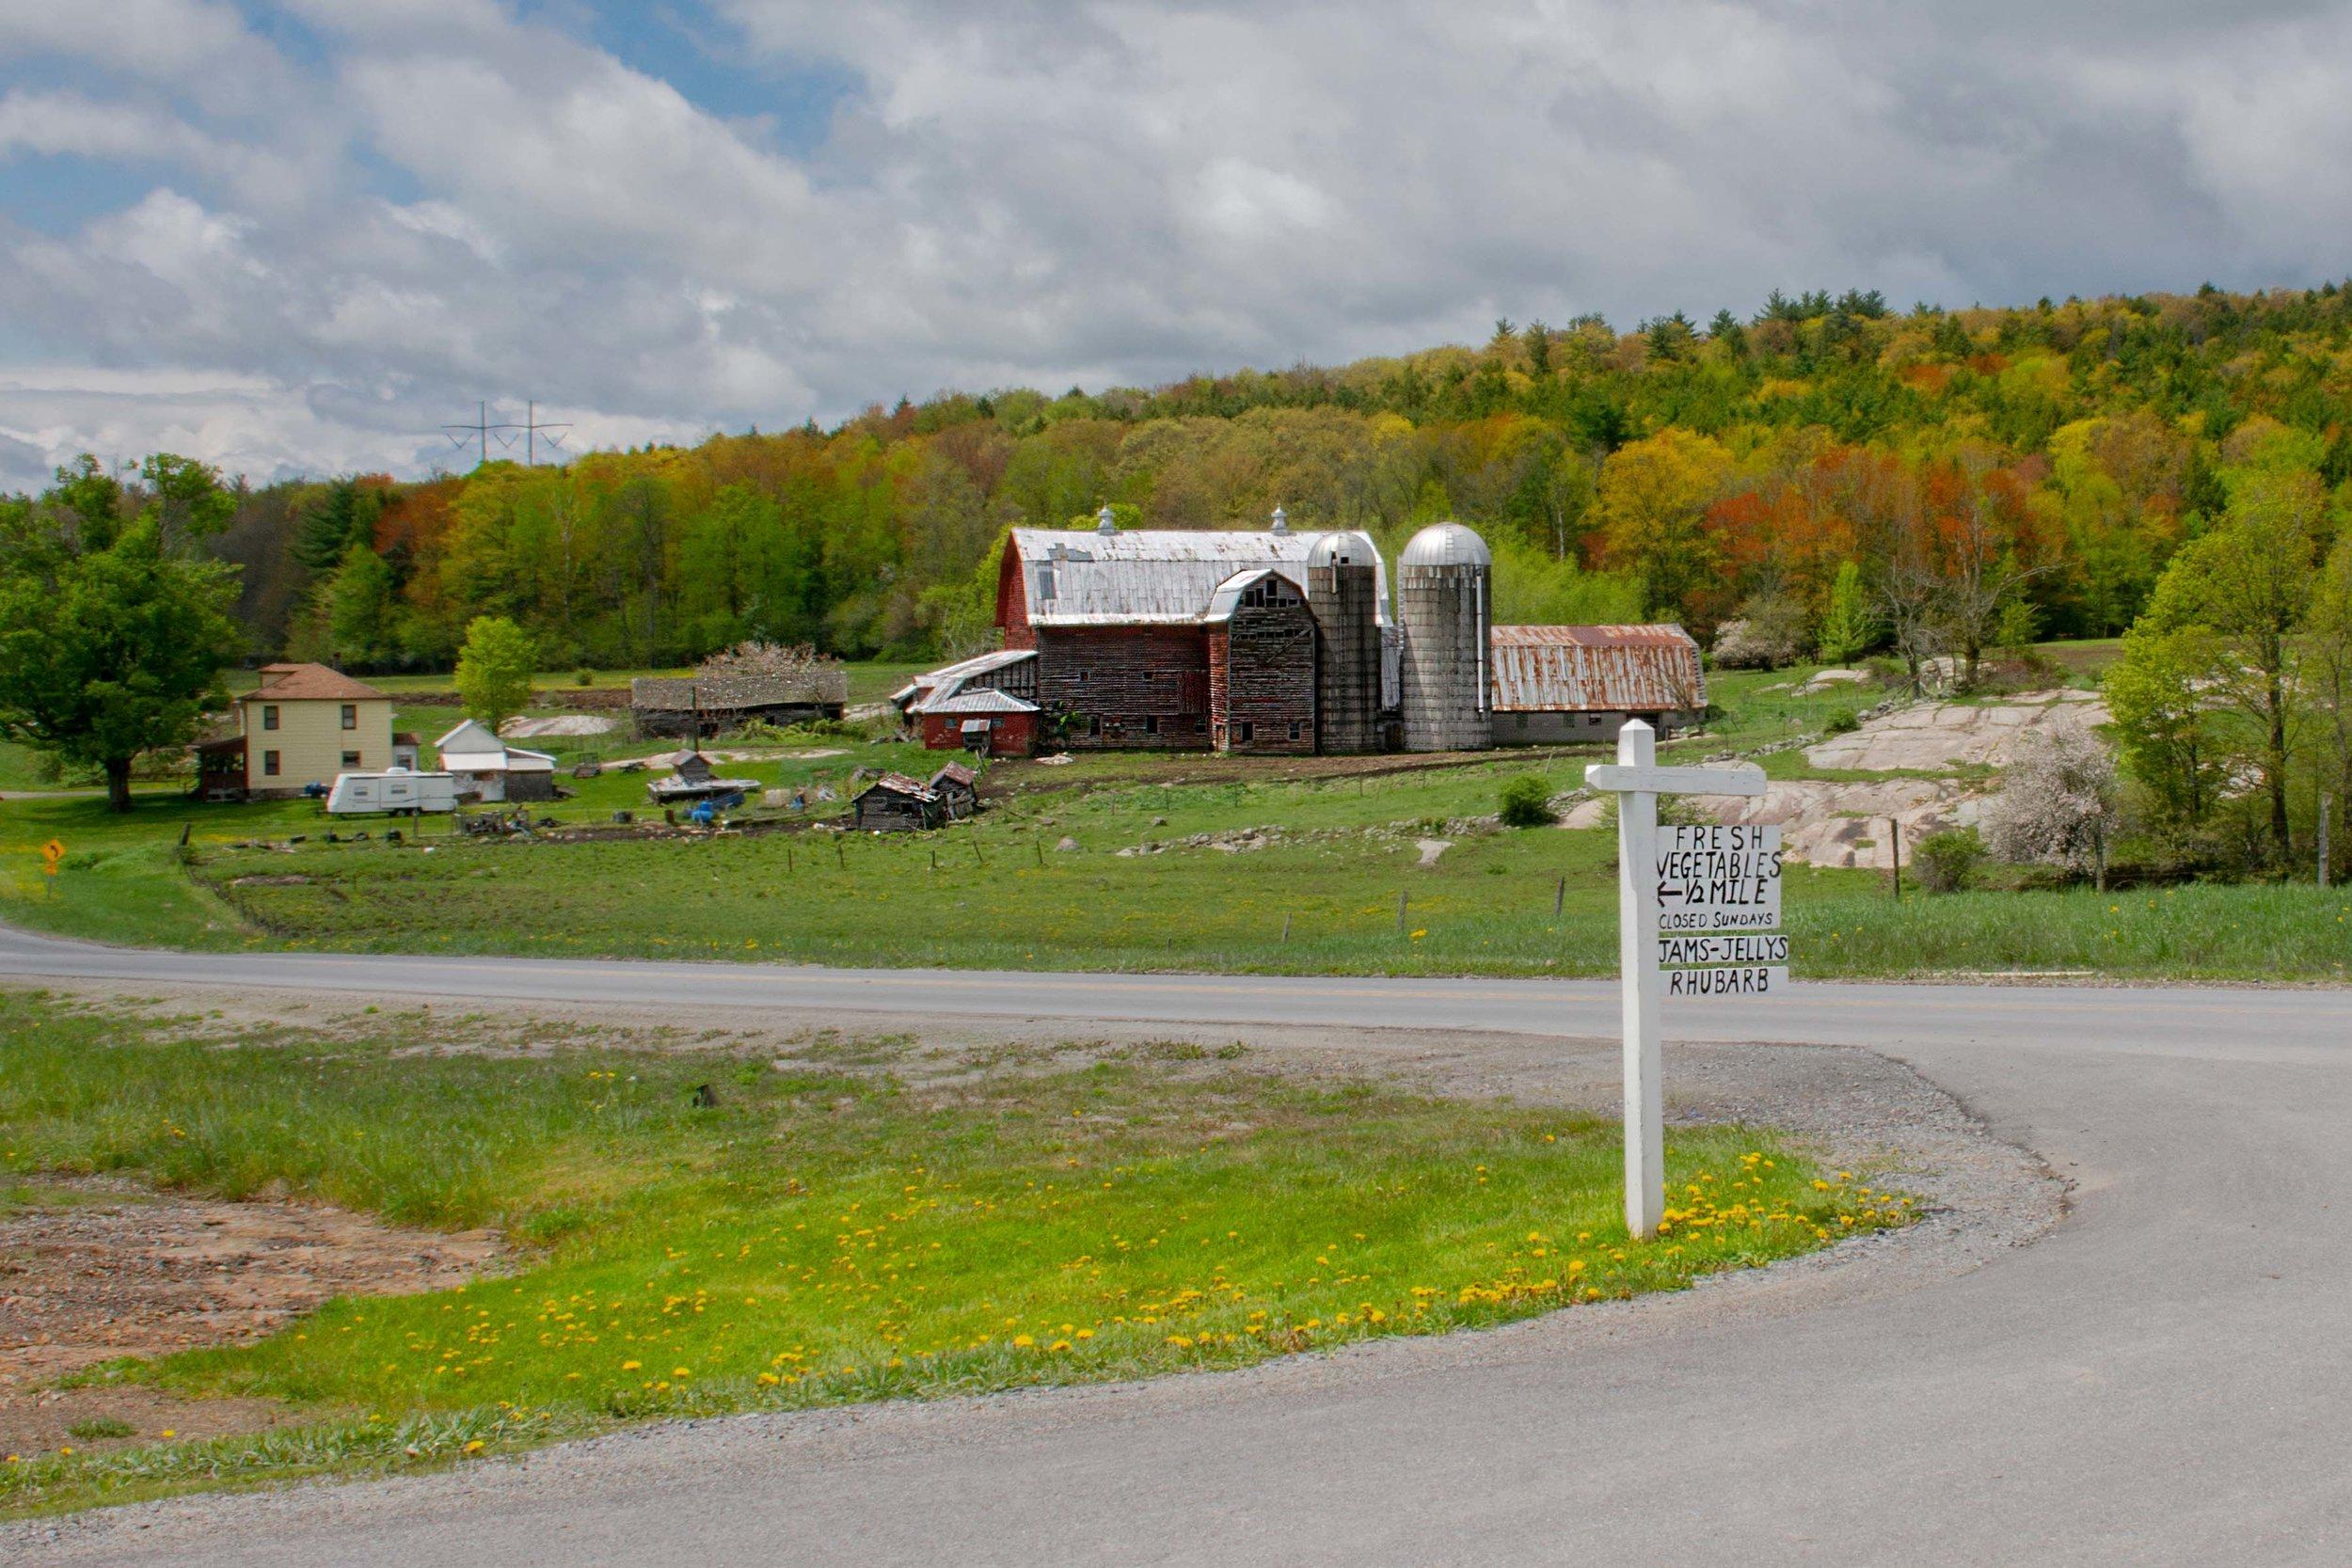 farm fresh 5579  12x8 300ppi.jpg